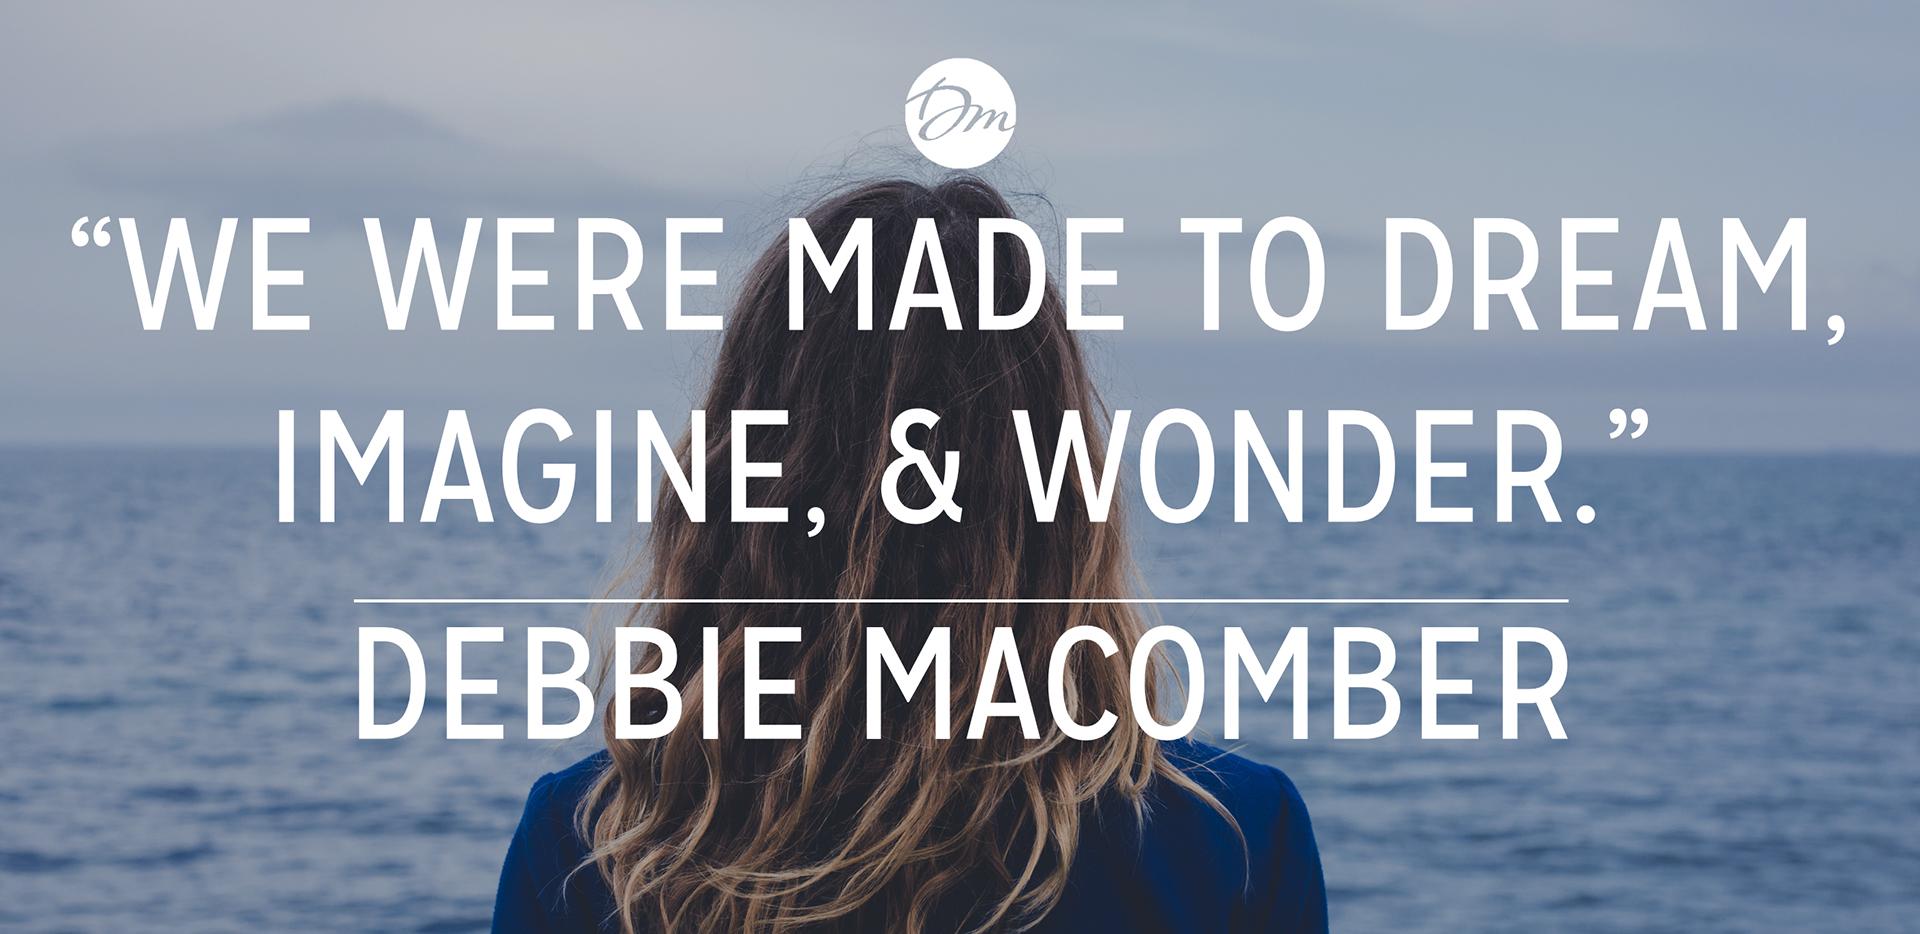 Quotes — Debbie Macomber